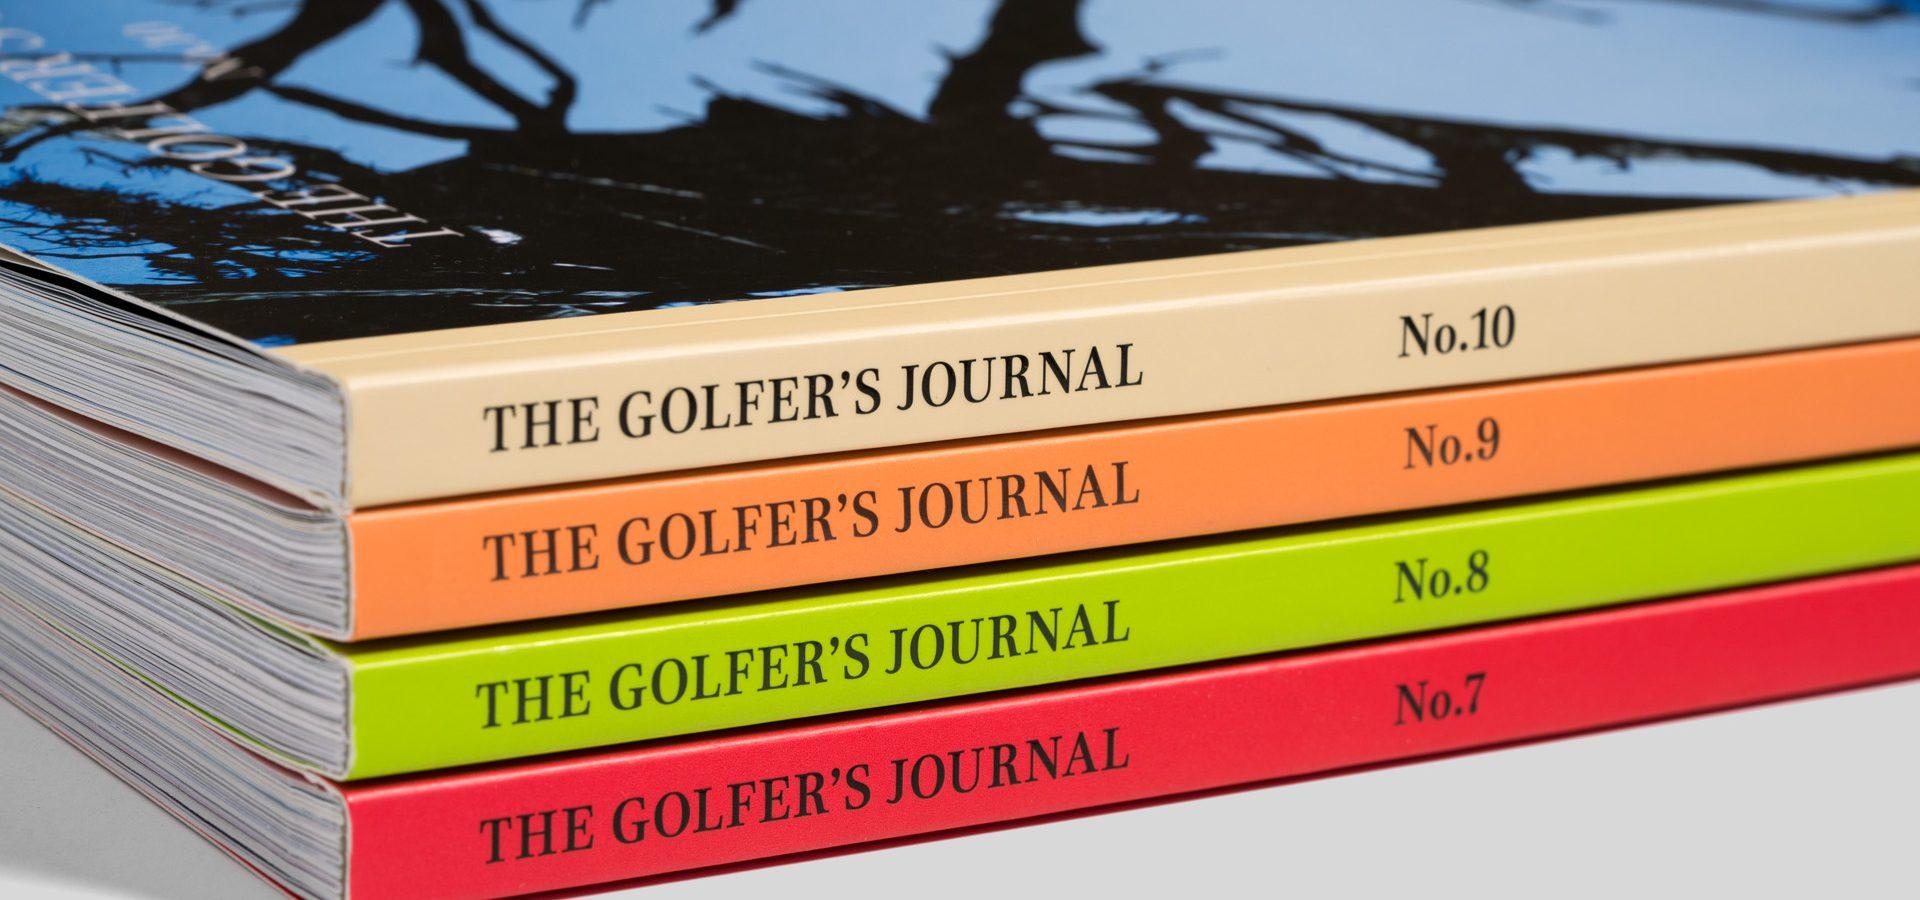 The Golfer's Journal